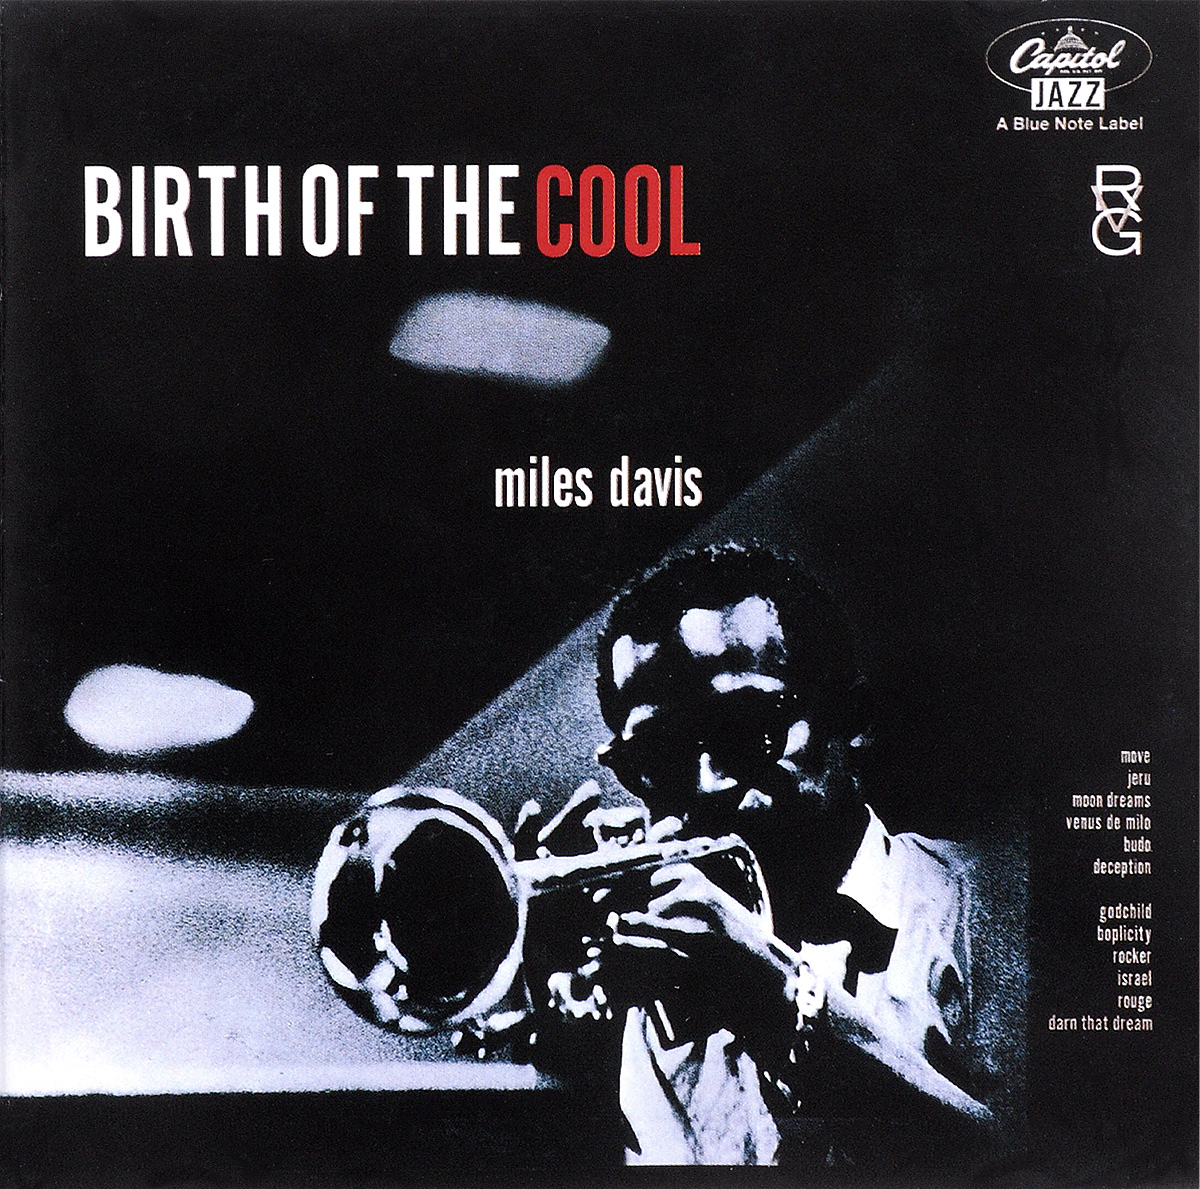 Майлз Дэвис,Denzil Best,Джерри Маллиган,Джордж Уоллингтон,Джон Льюис Miles Davis. Birth Of The Cool майлз дэвис miles davis someday my prince will come lp